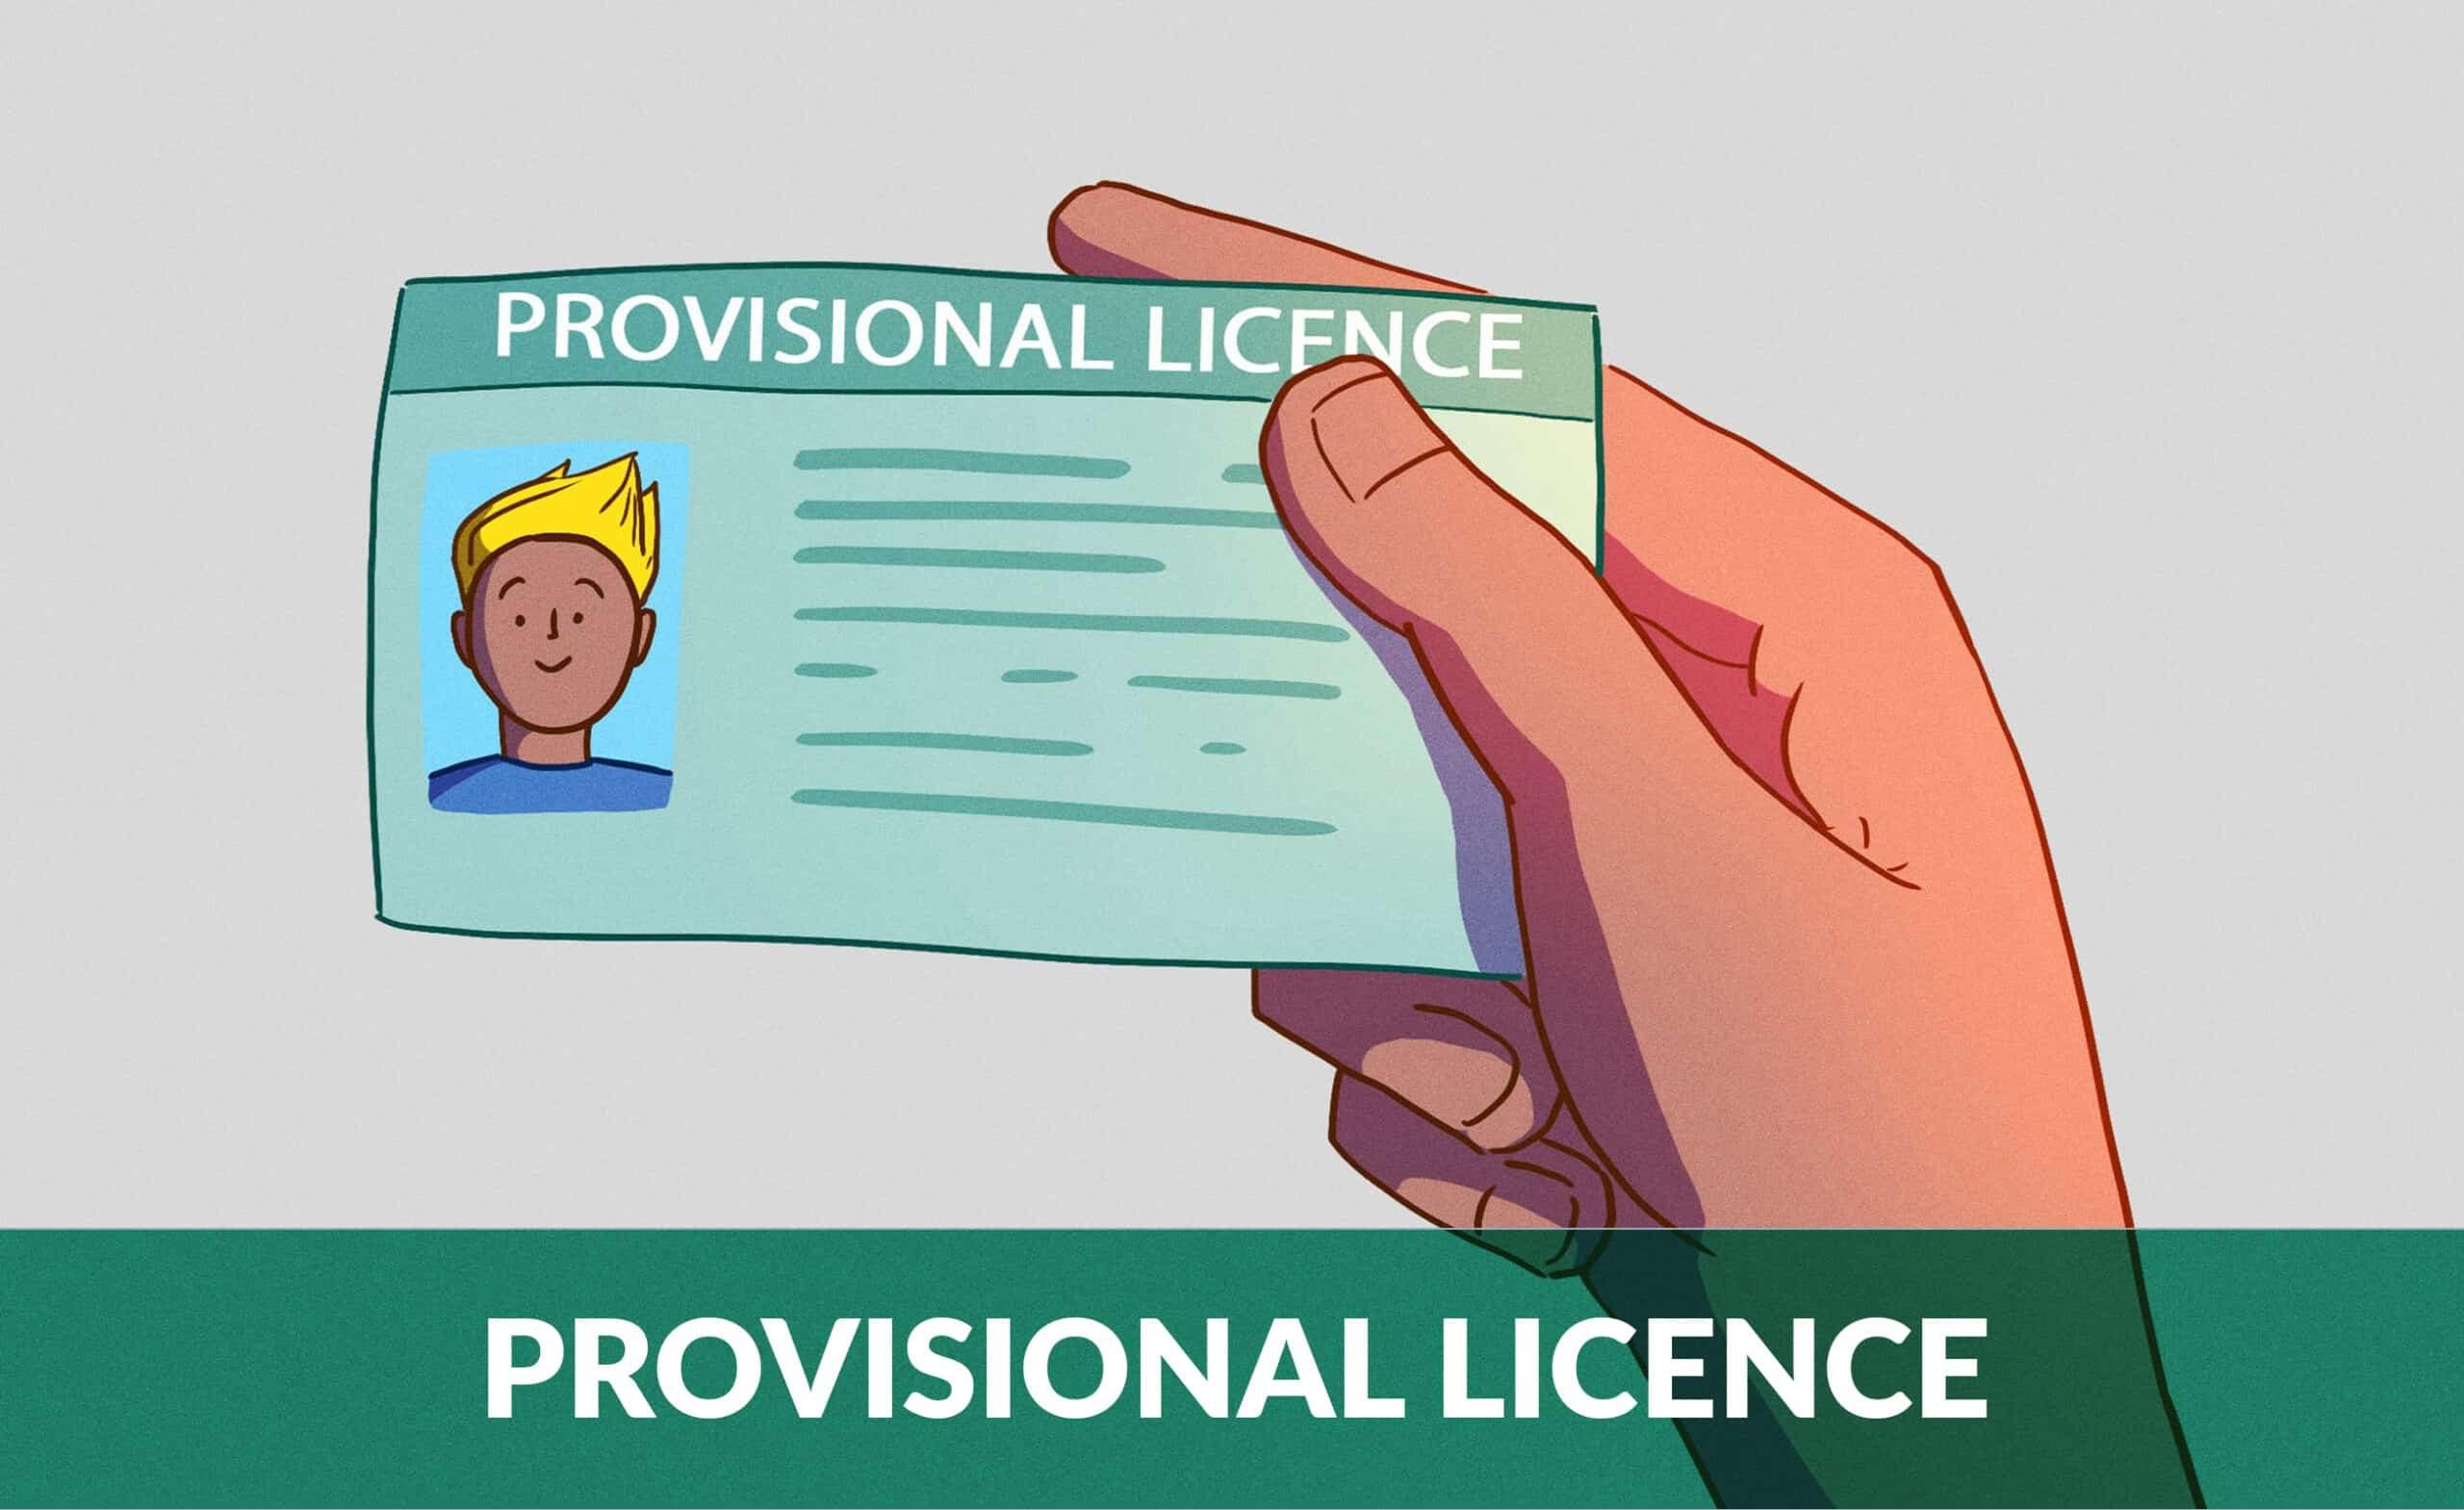 provisinal licence